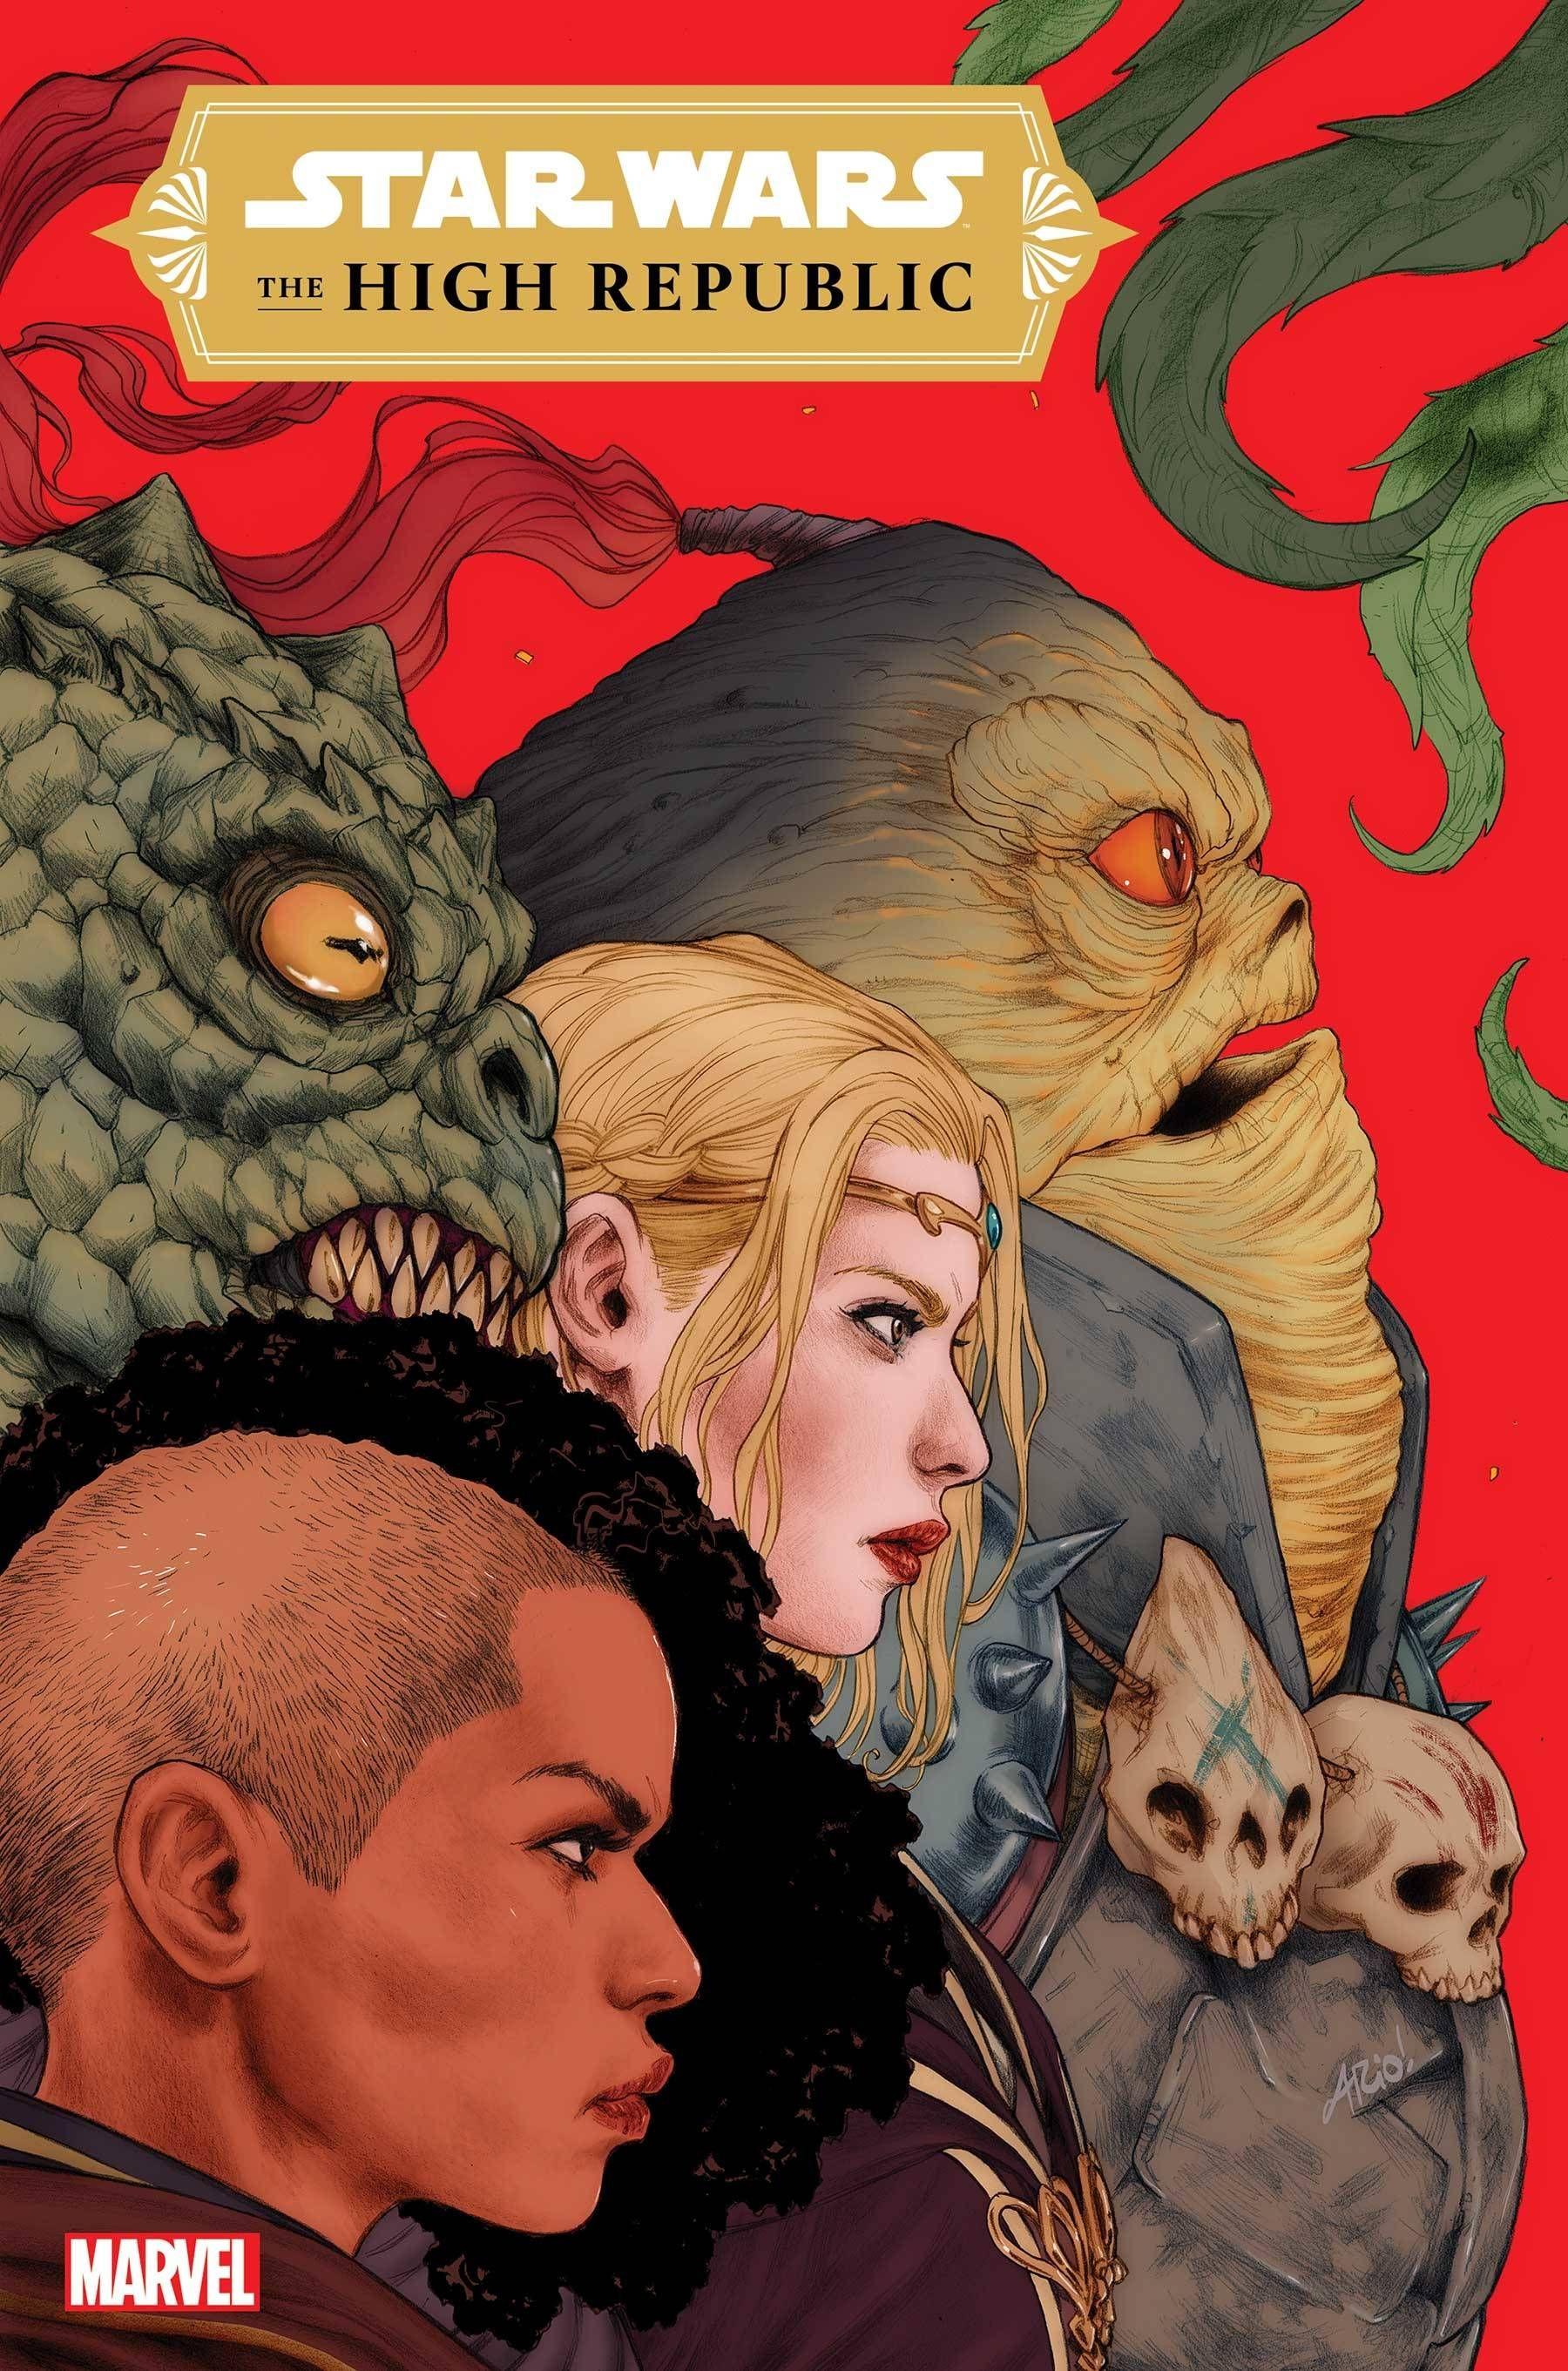 eyJidWNrZXQiOiJnb2NvbGxlY3QuaW1hZ2VzLnB1YiIsImtleSI6ImY3ZDA0MjMxLTY5ZWUtNDQyYi04Y2ViLTBjYzk4YTg3ODY1OC5qcGciLCJlZGl0cyI6W119 ComicList: Marvel Comics New Releases for 08/11/2021